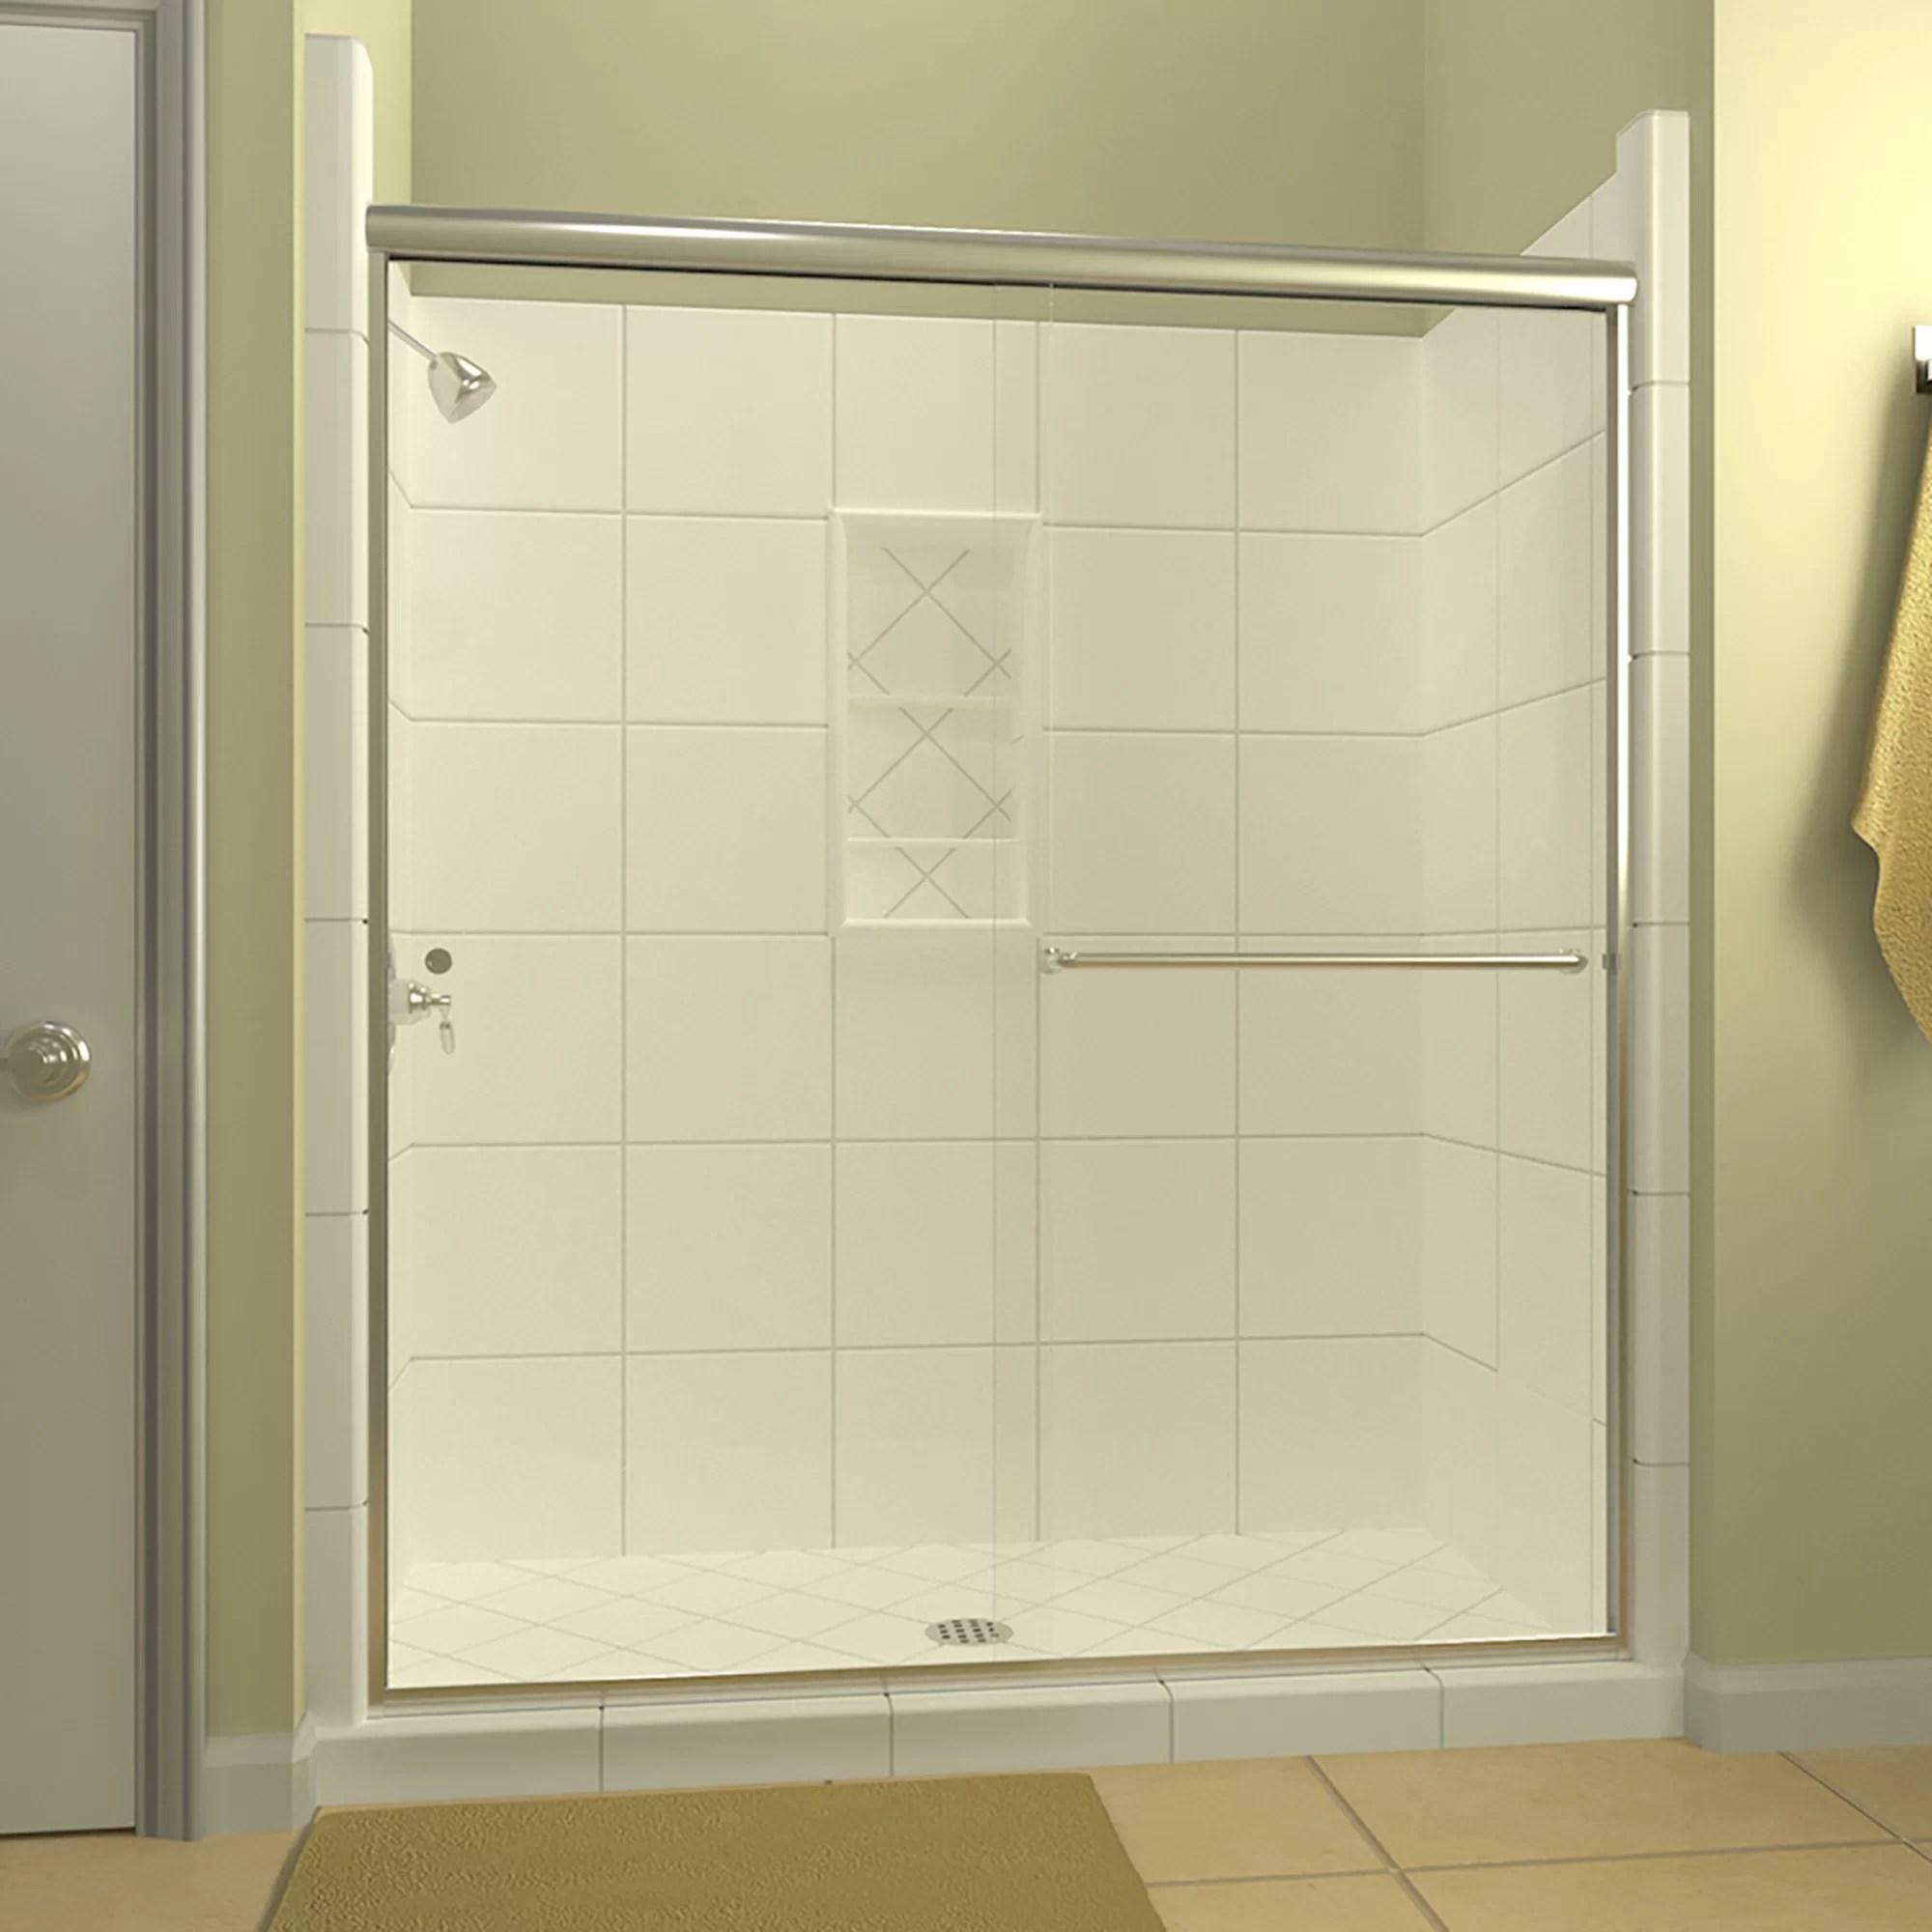 Details About Leser 60 X65 38 Bypass Semi Frameless Shower Door Right Opening Anodized Oil Ru